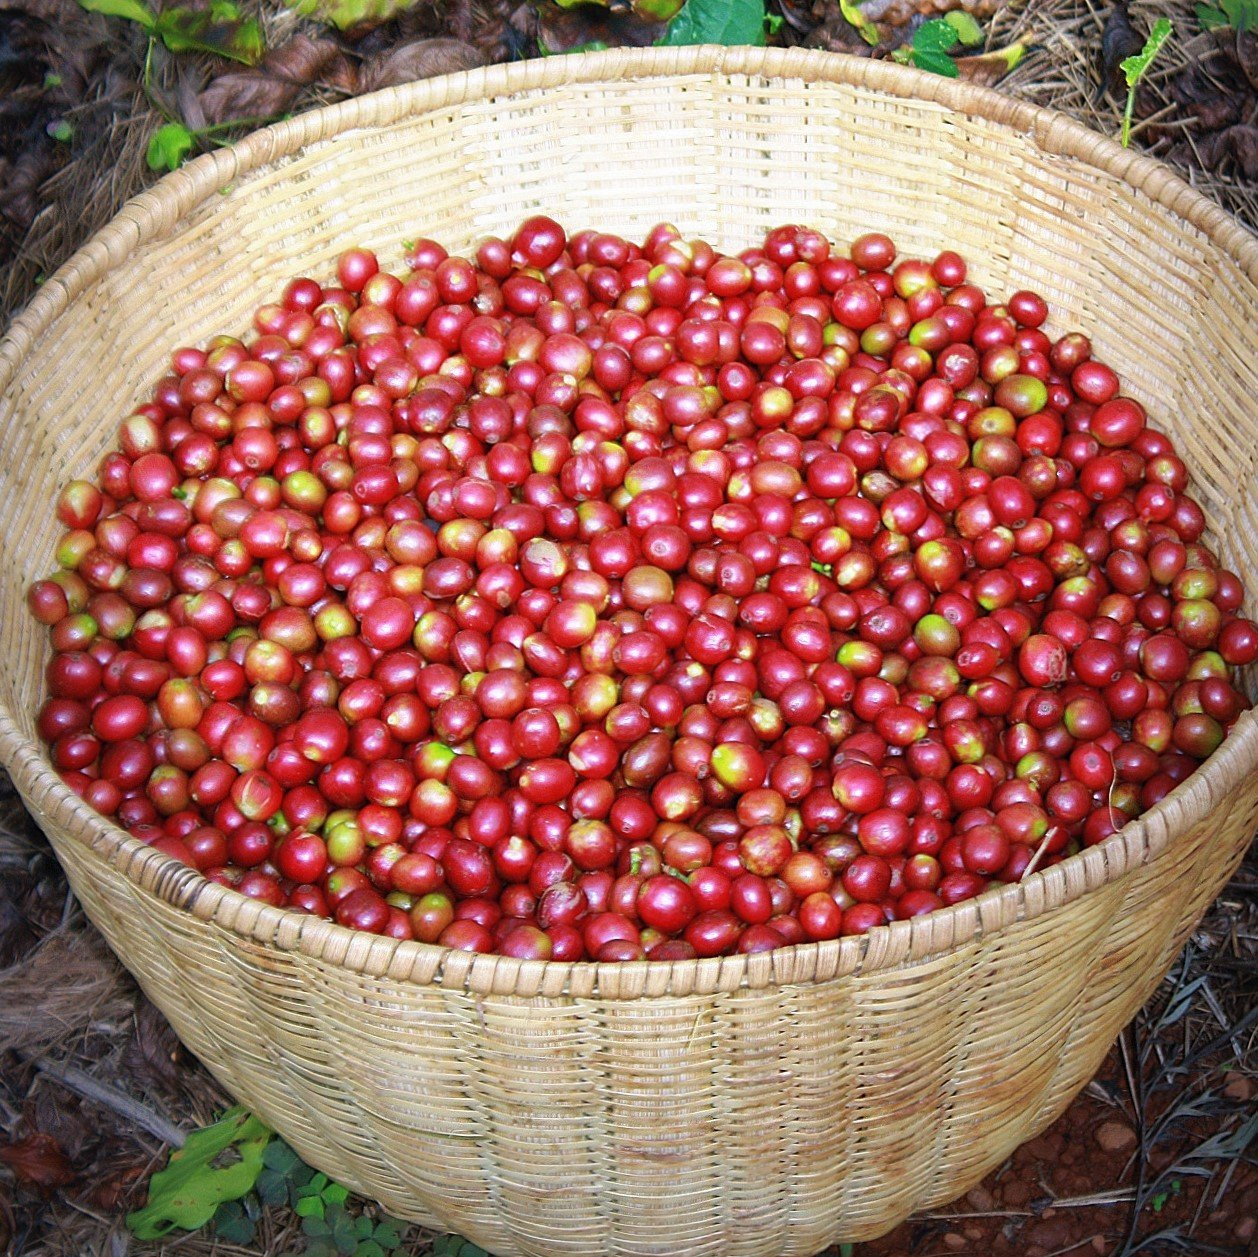 (5 lbs) Decaf Sumatra Mandheling Green Unroasted Coffee Beans - Specialty Grade Arabica Raw Coffee - 5 lb Bulk Bag Size - Shade Grown